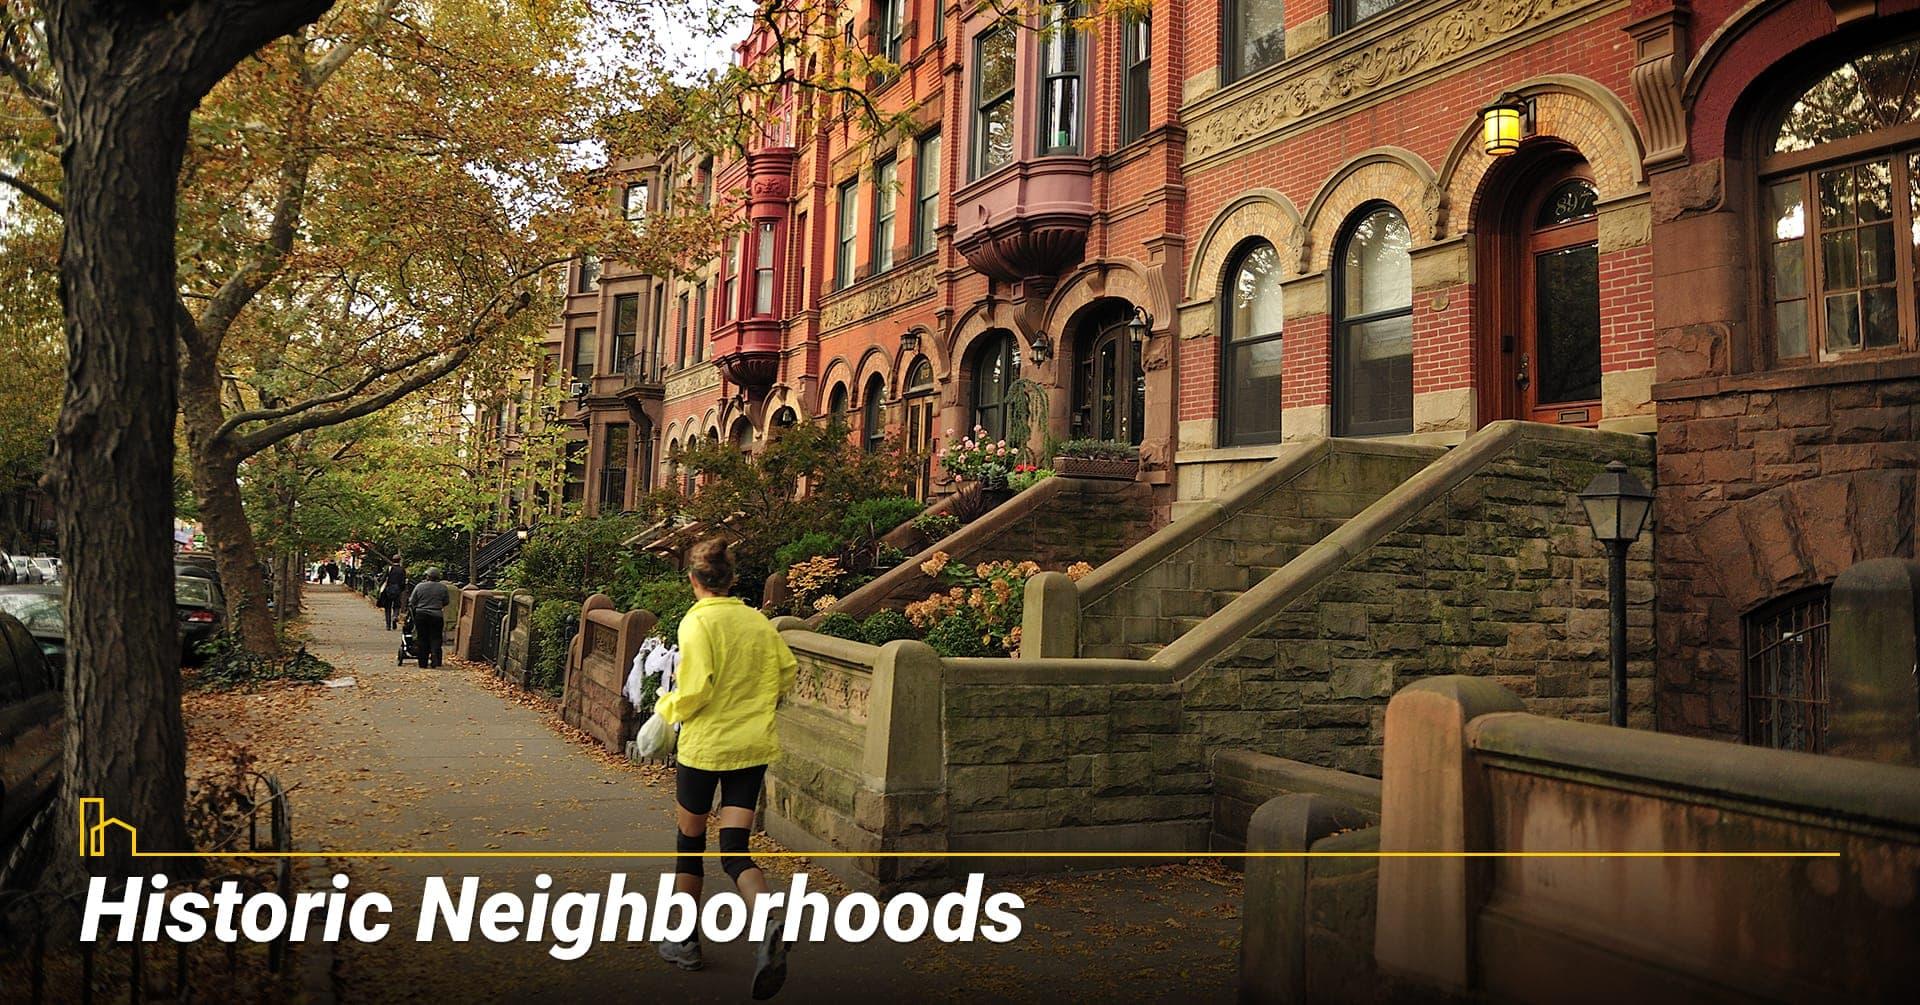 Historic Neighborhoods, living a historic neighborhood